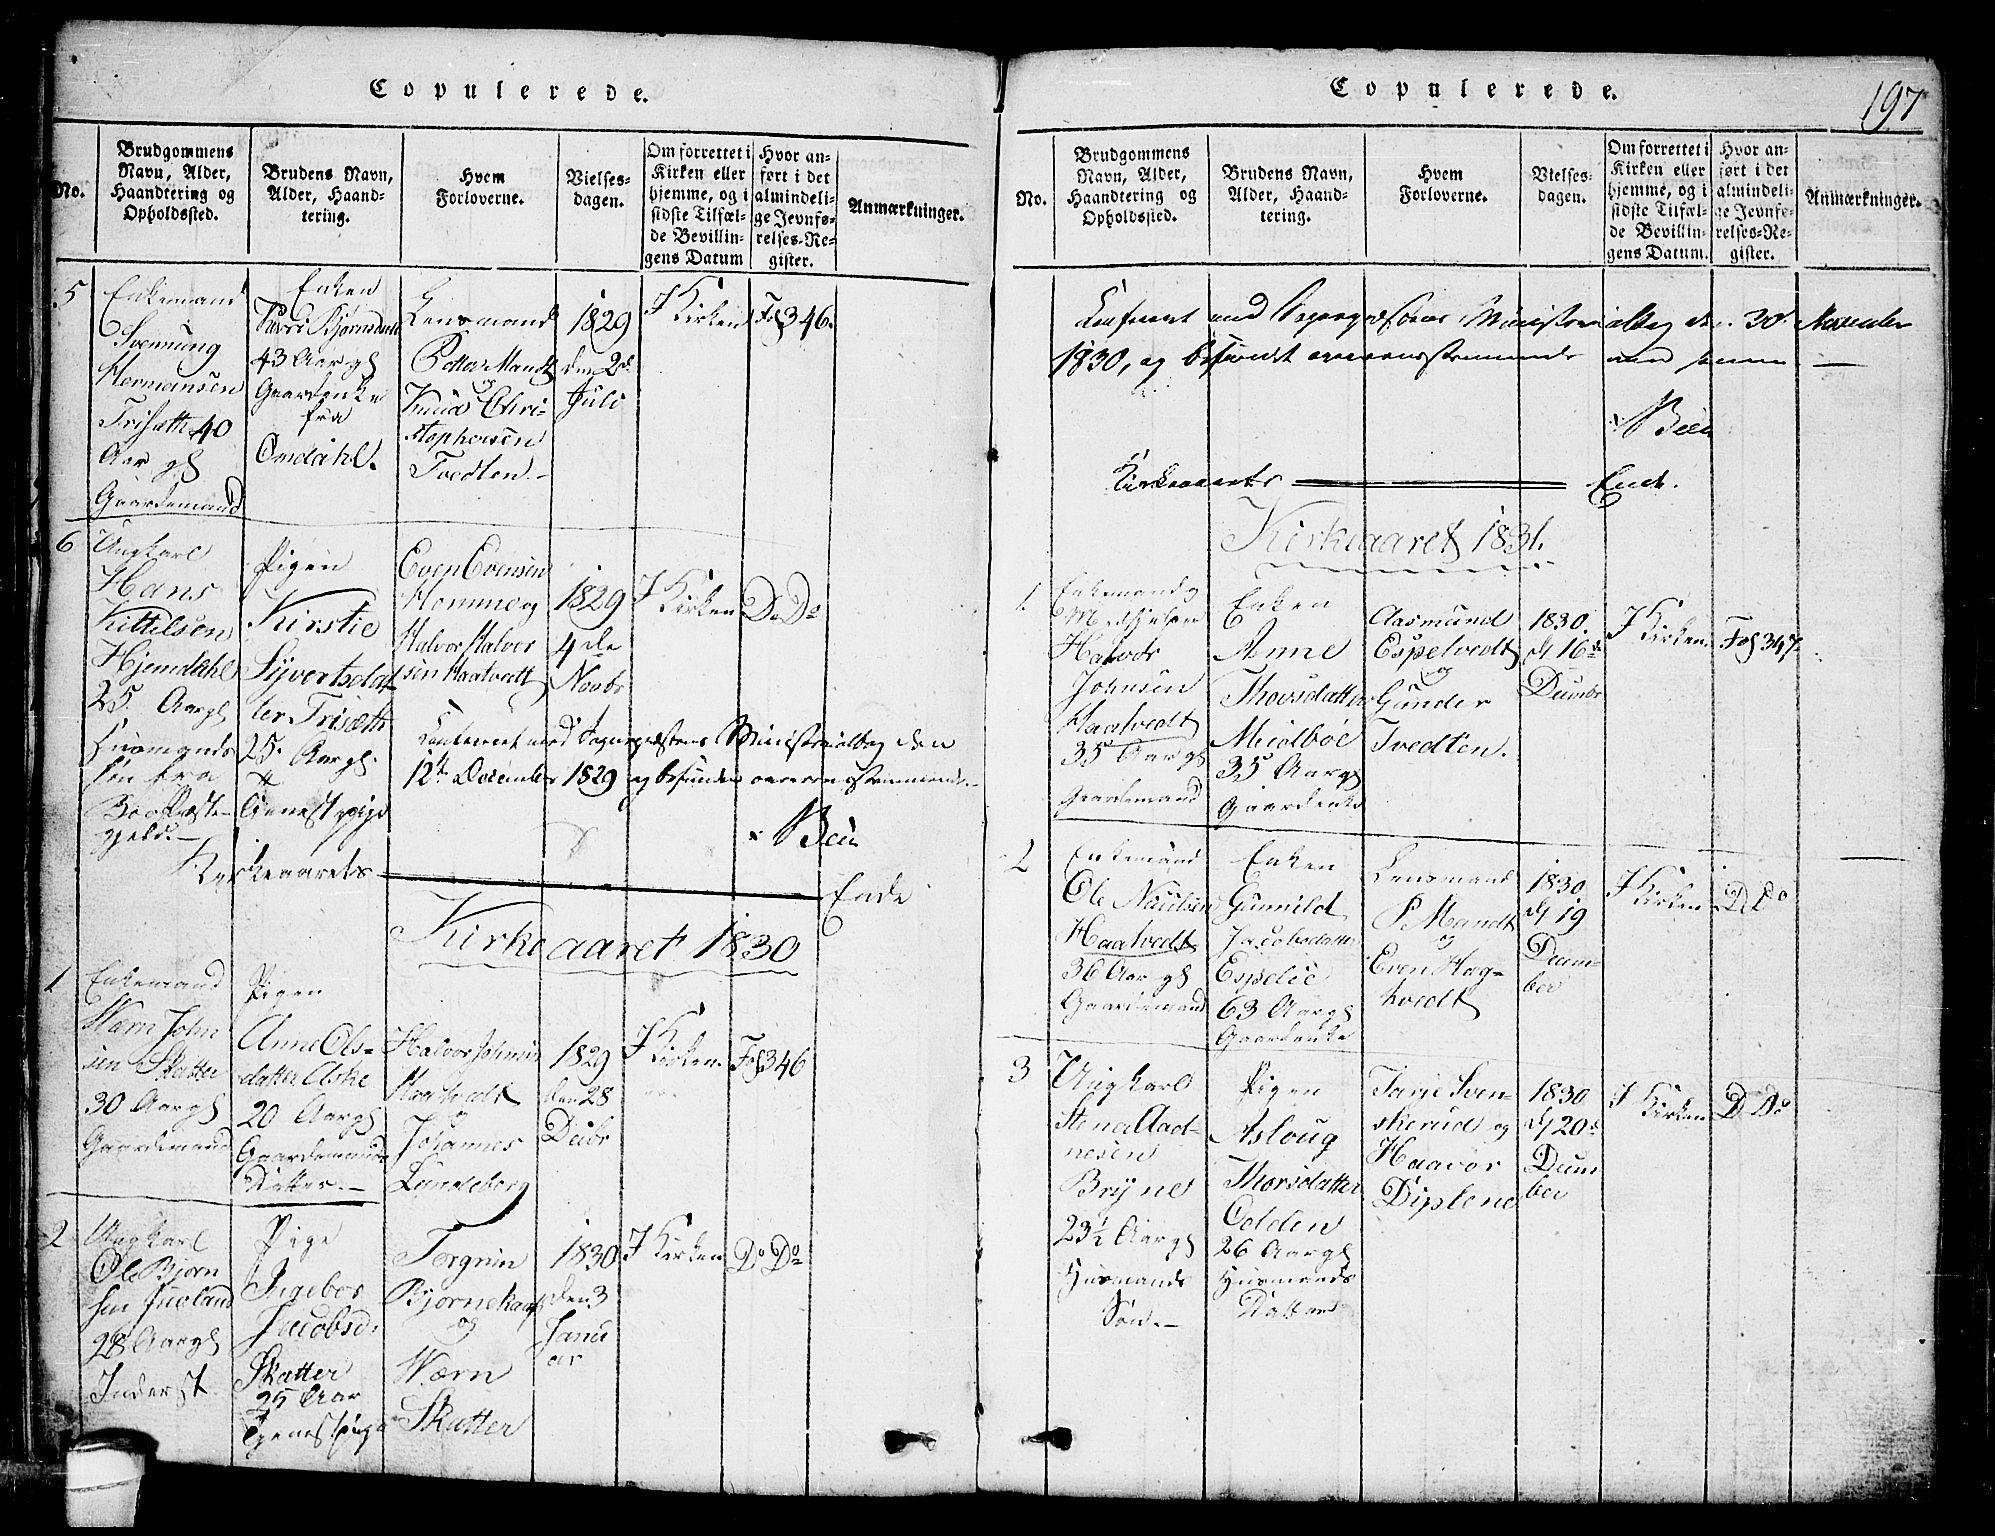 SAKO, Lårdal kirkebøker, G/Ga/L0001: Klokkerbok nr. I 1, 1815-1861, s. 197